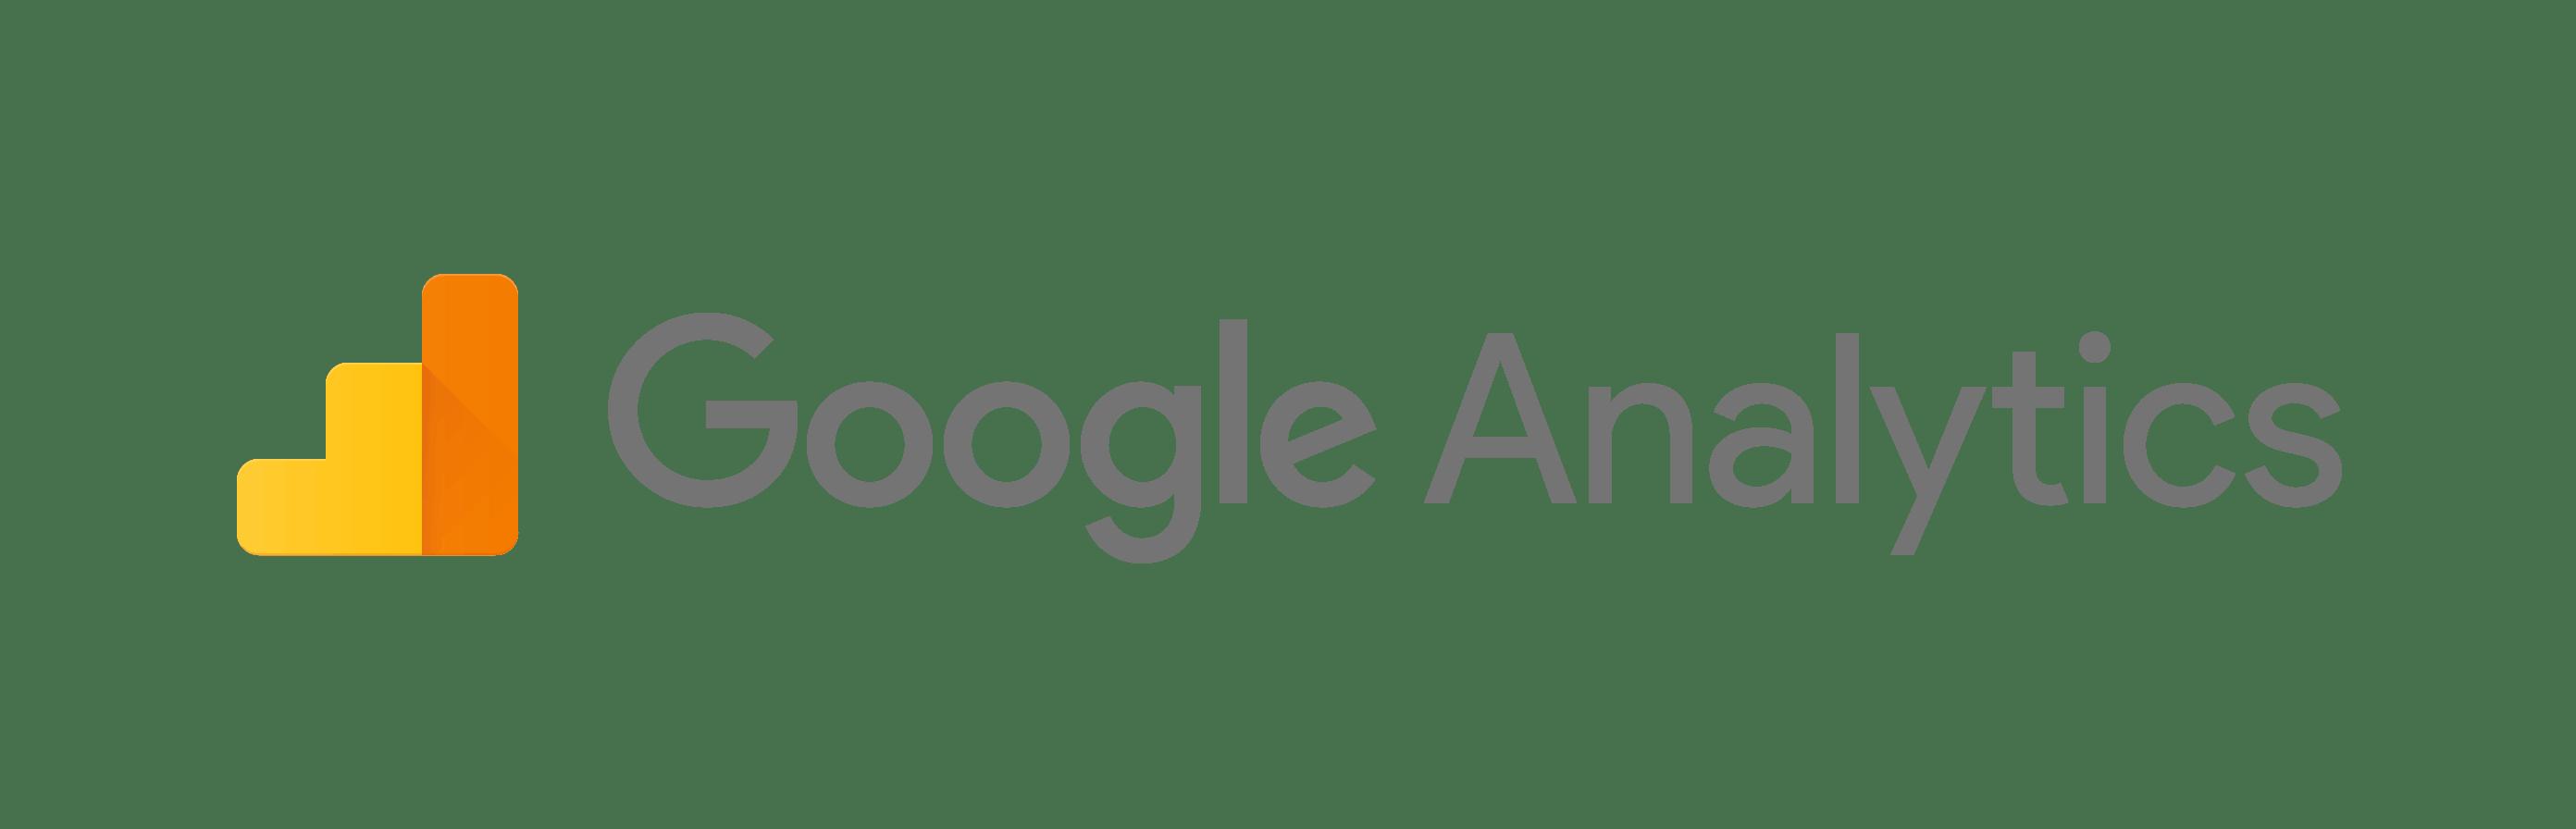 Google Analytics لمعرفة سلوك عملائك بشكل صحيح